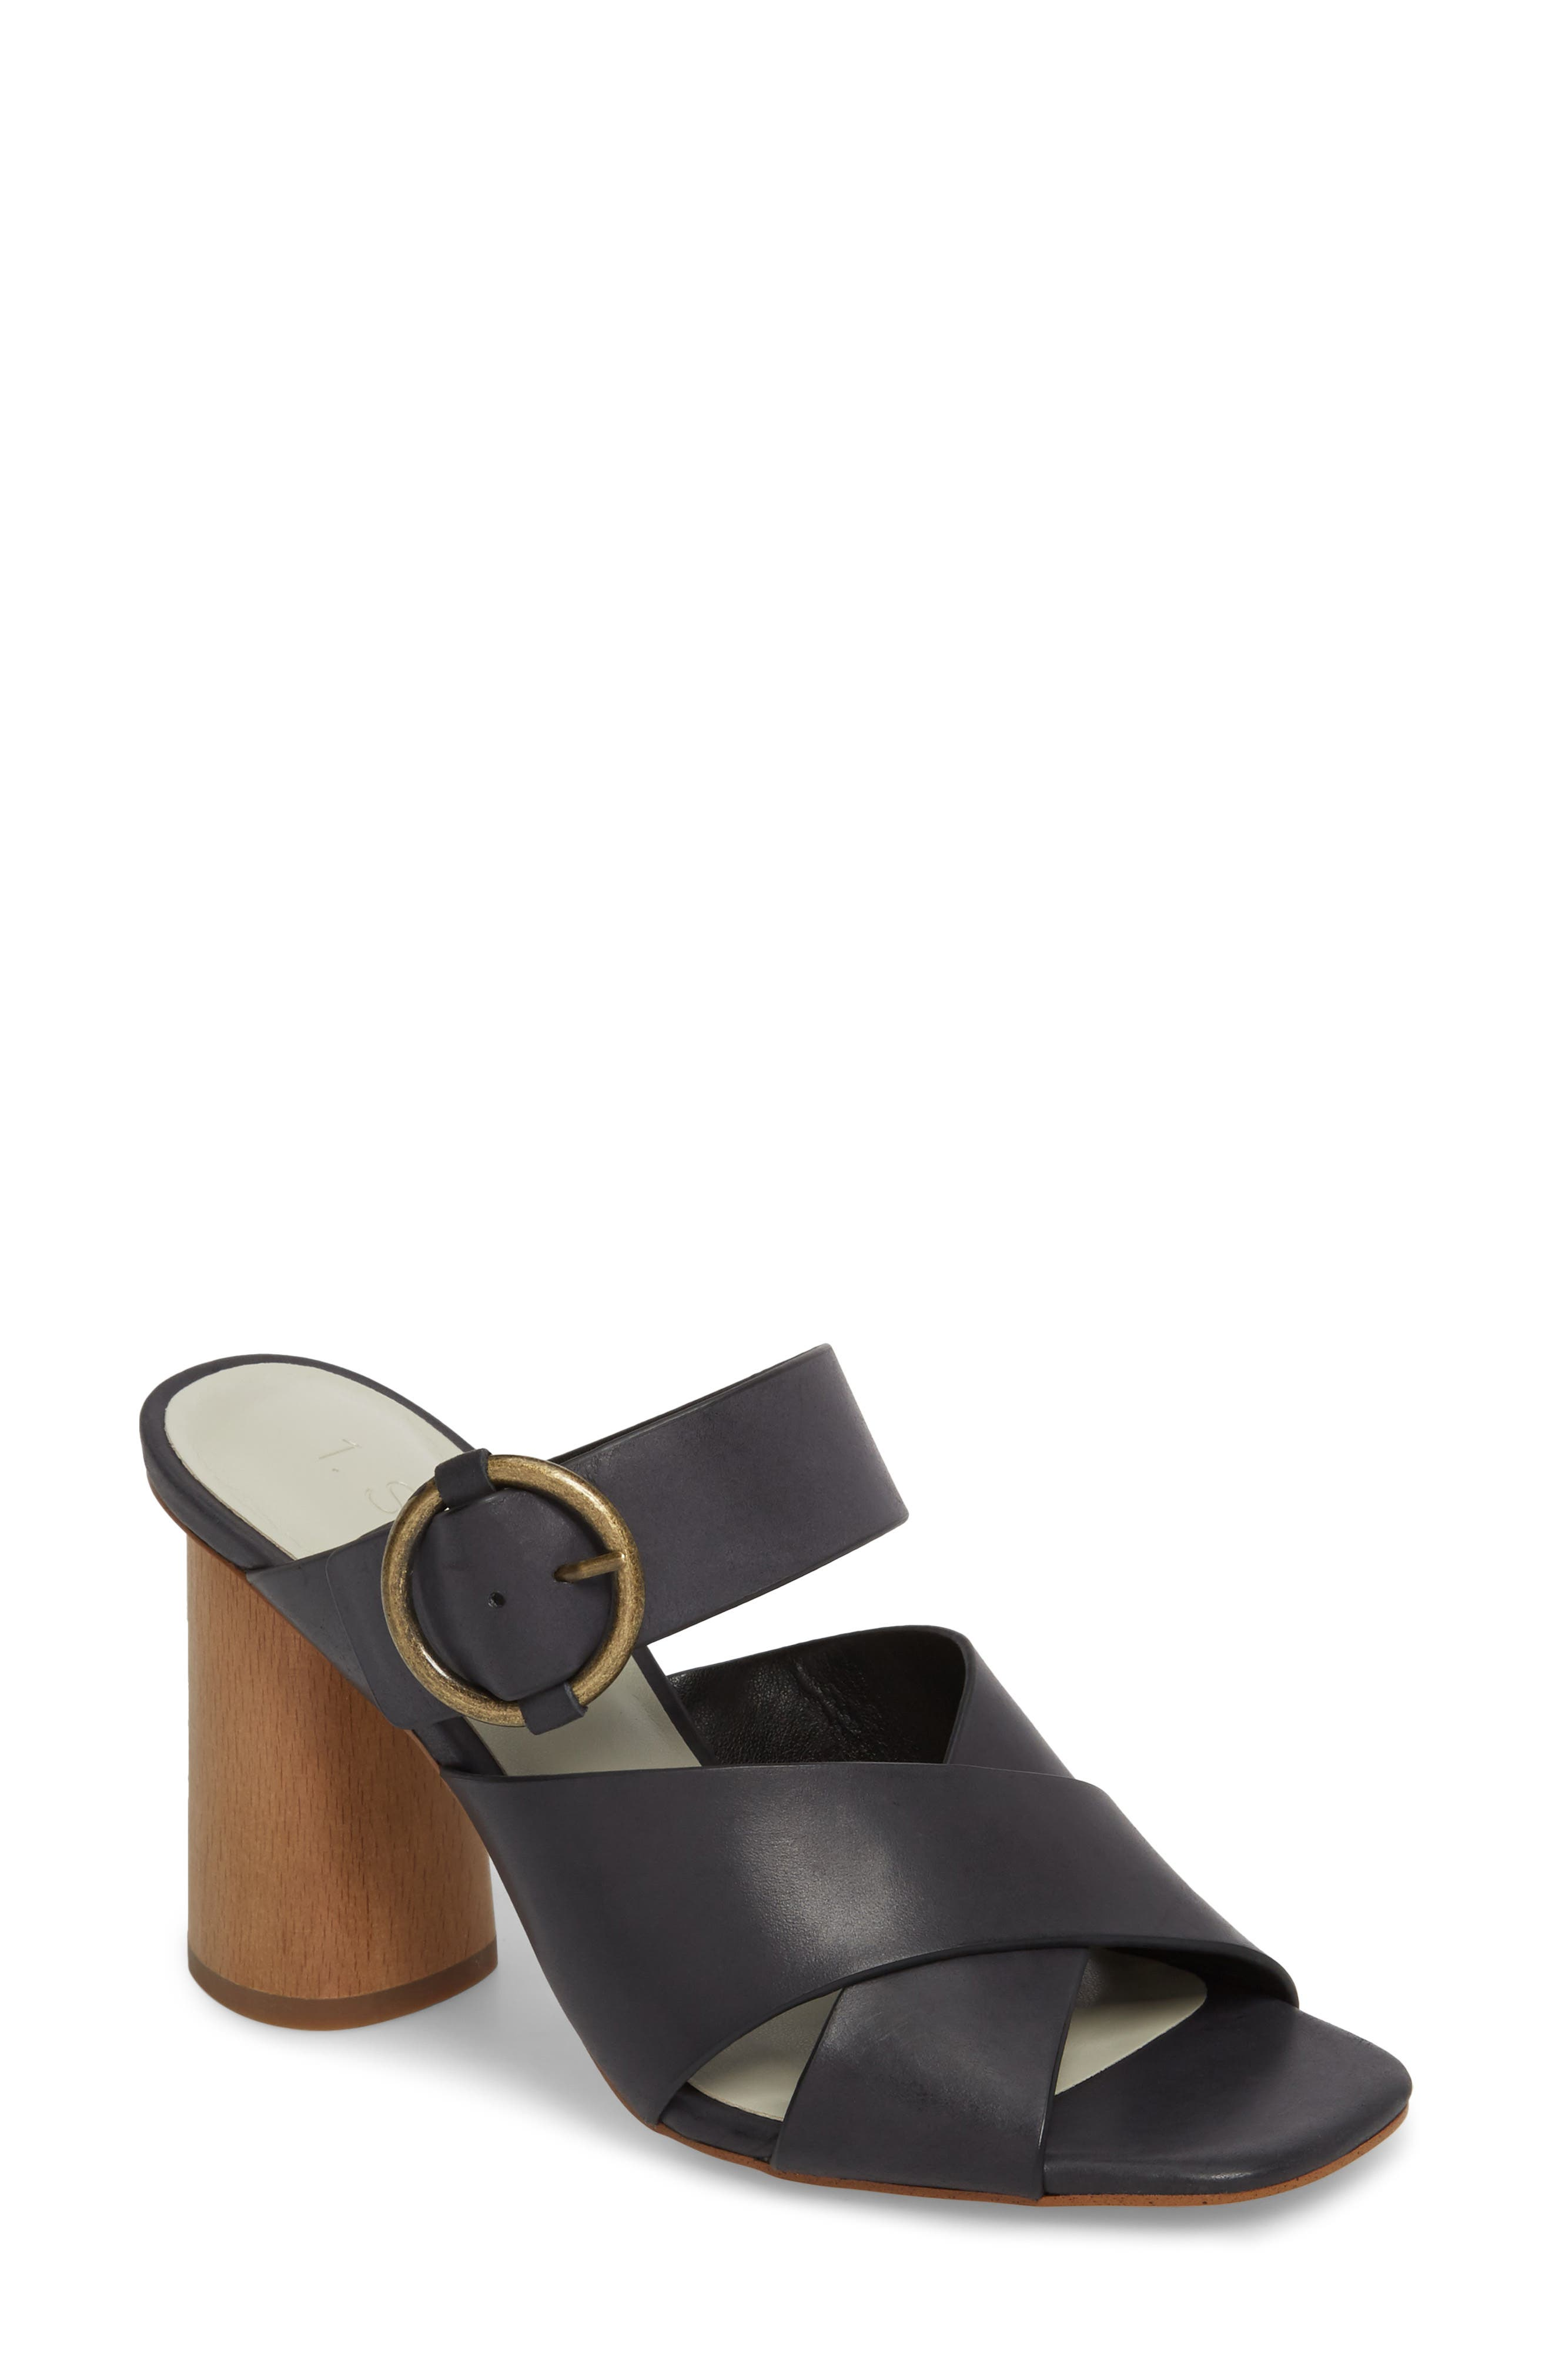 Icendra Flared Heel Mule Sandal,                             Main thumbnail 1, color,                             BLACK LEATHER